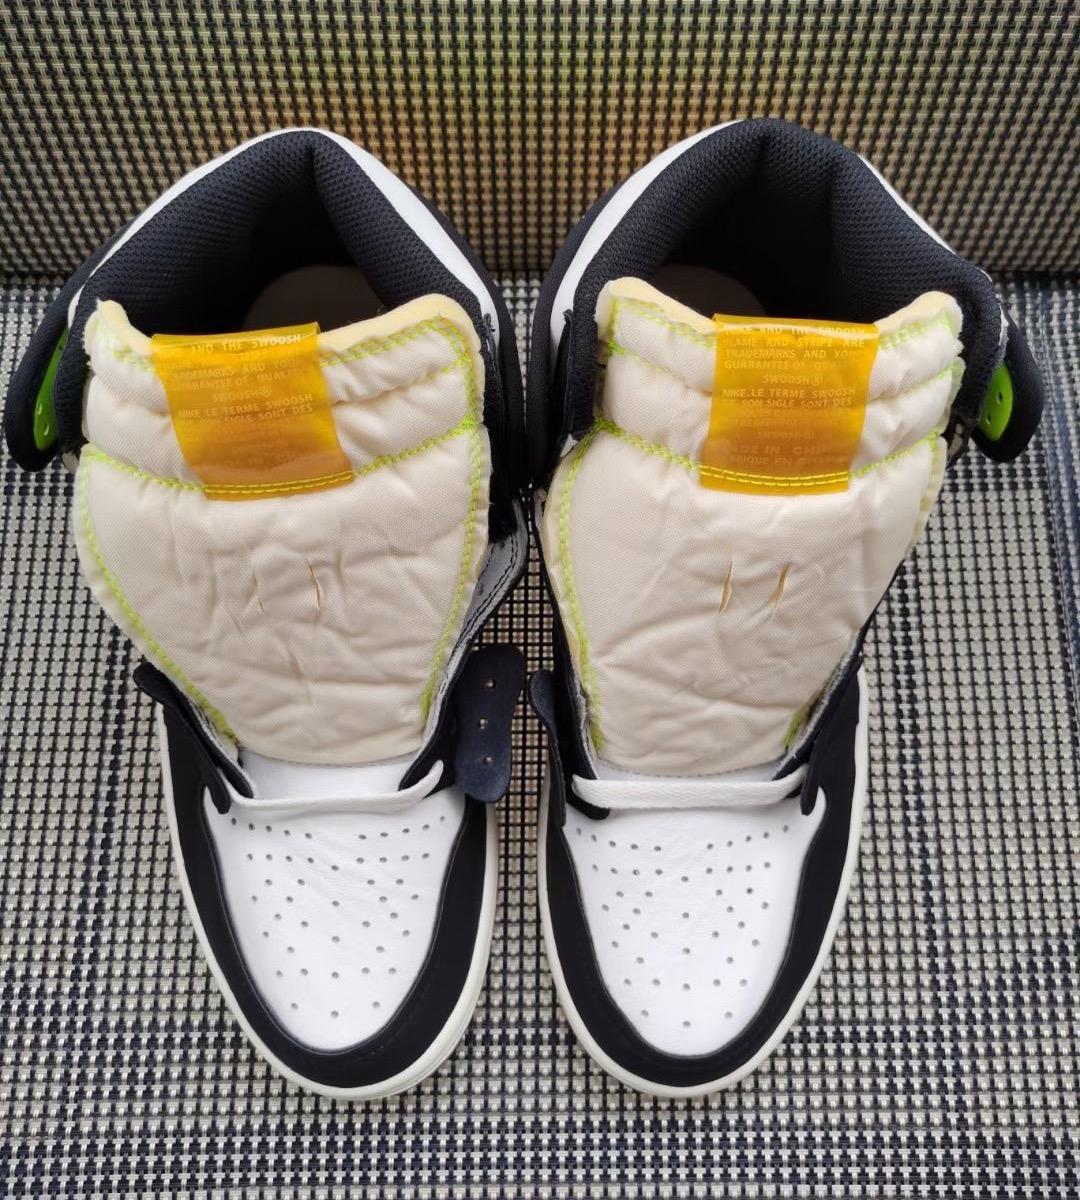 Air Jordan 1 High OG Volt Gold 555088-118 Release Date